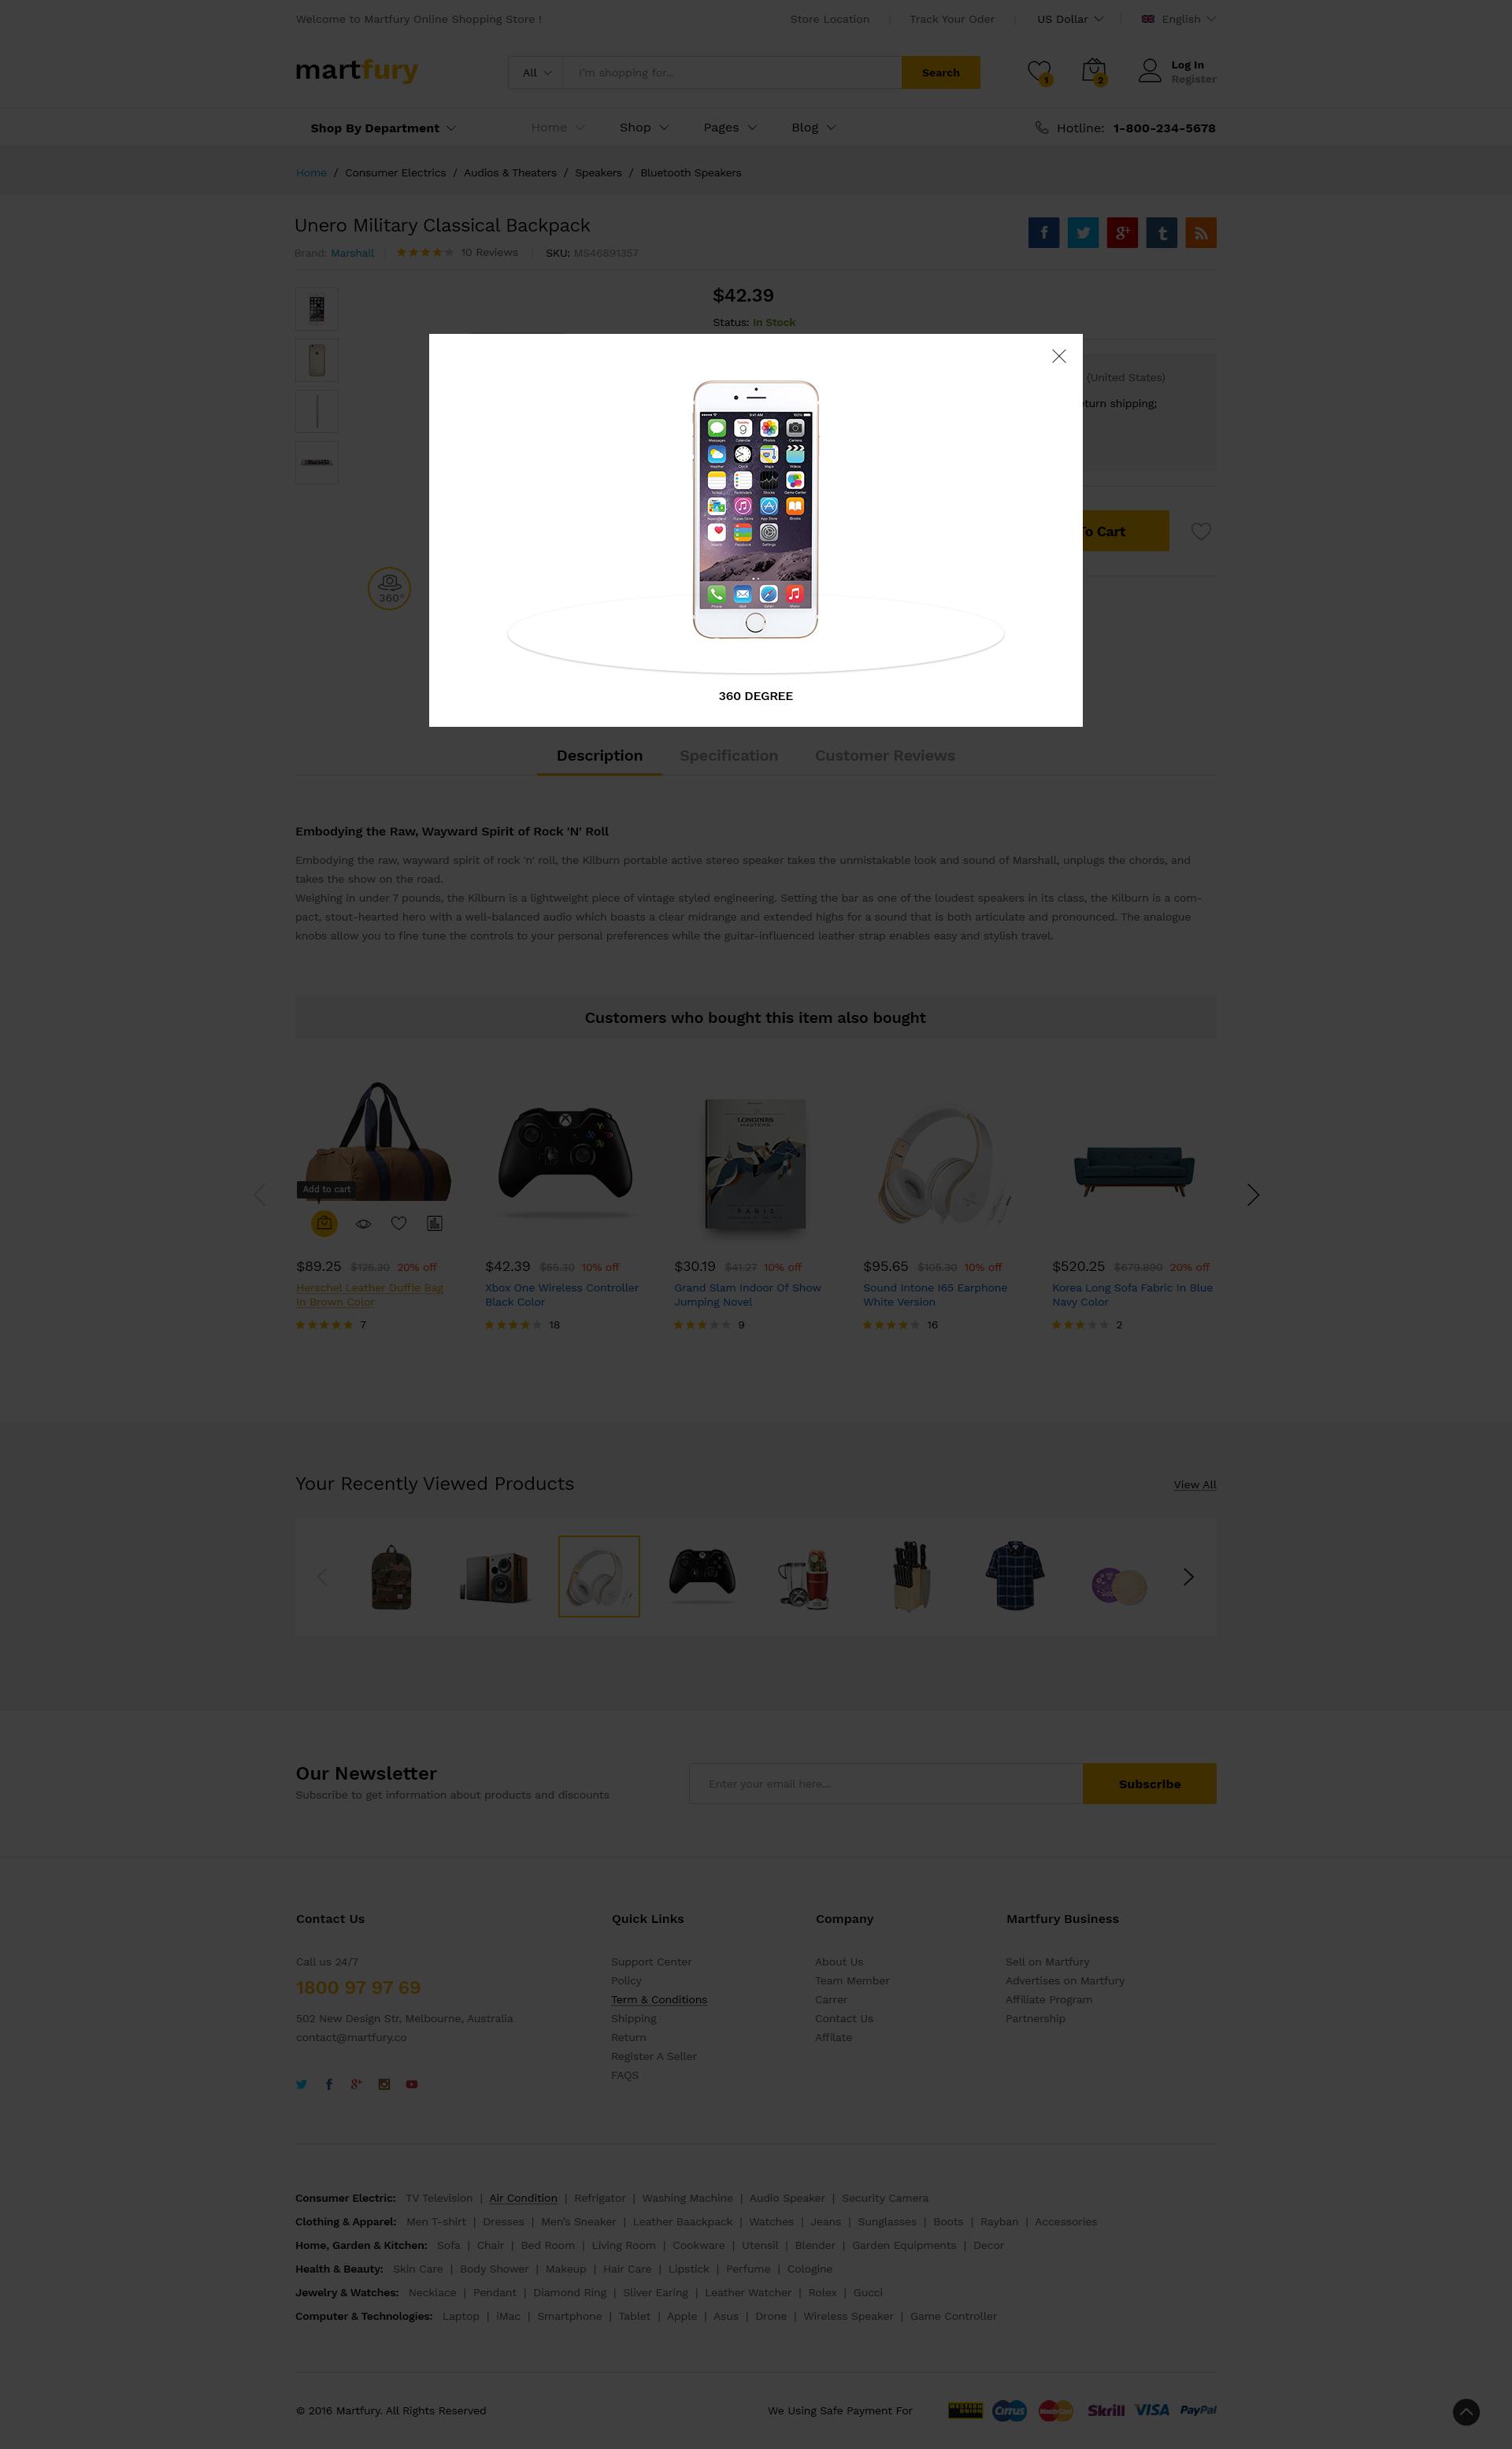 MartFury | Multi-Vendor & Marketplace eCommerce PSD Template by LoganCee